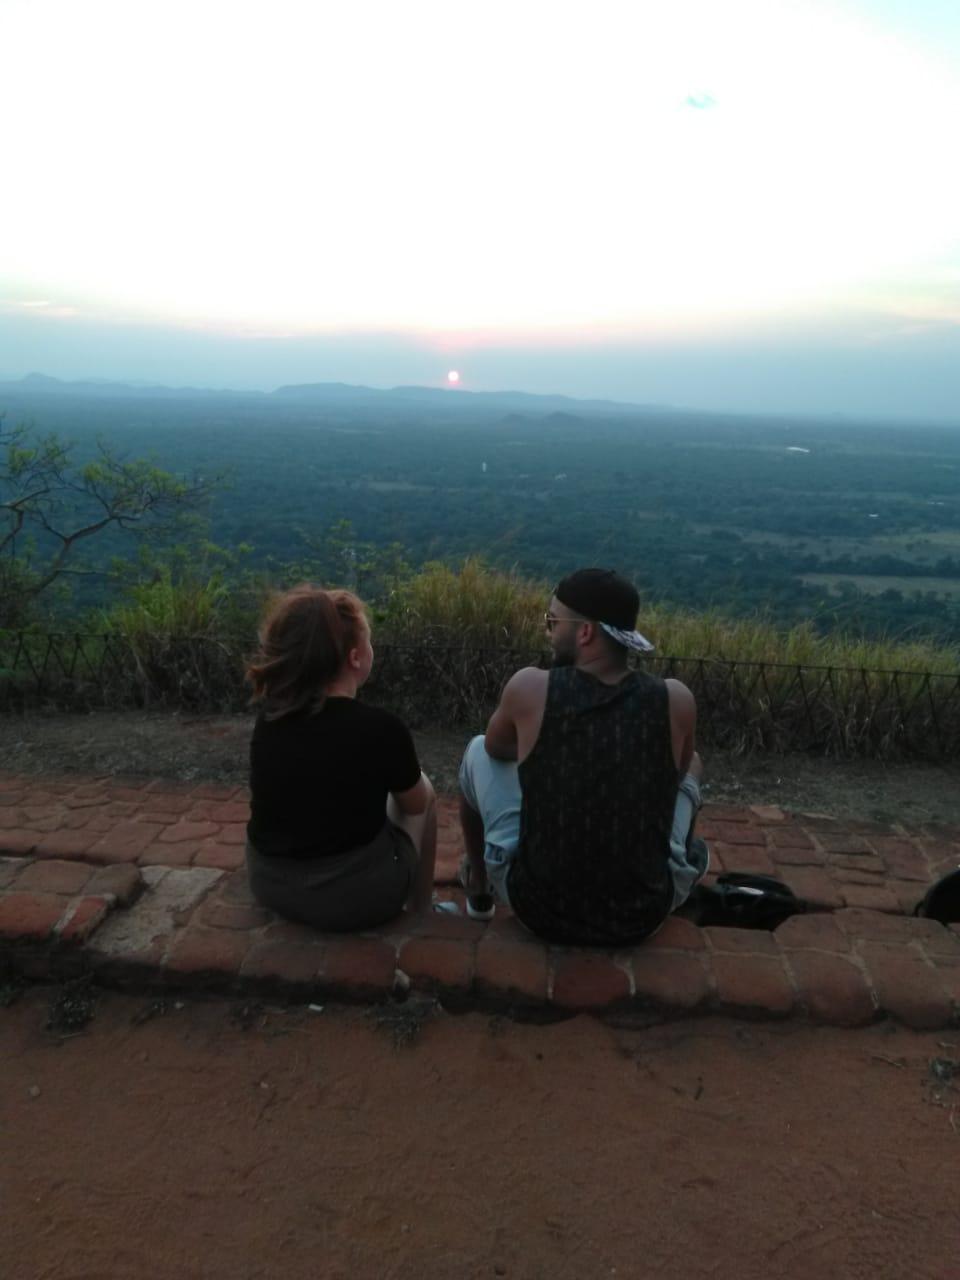 invite-to-paradise-sri-lanka-holiday-honeymoon-specialists-customer-feedback-elin-jordan-luce-sigiriya-sunset-1.JPG